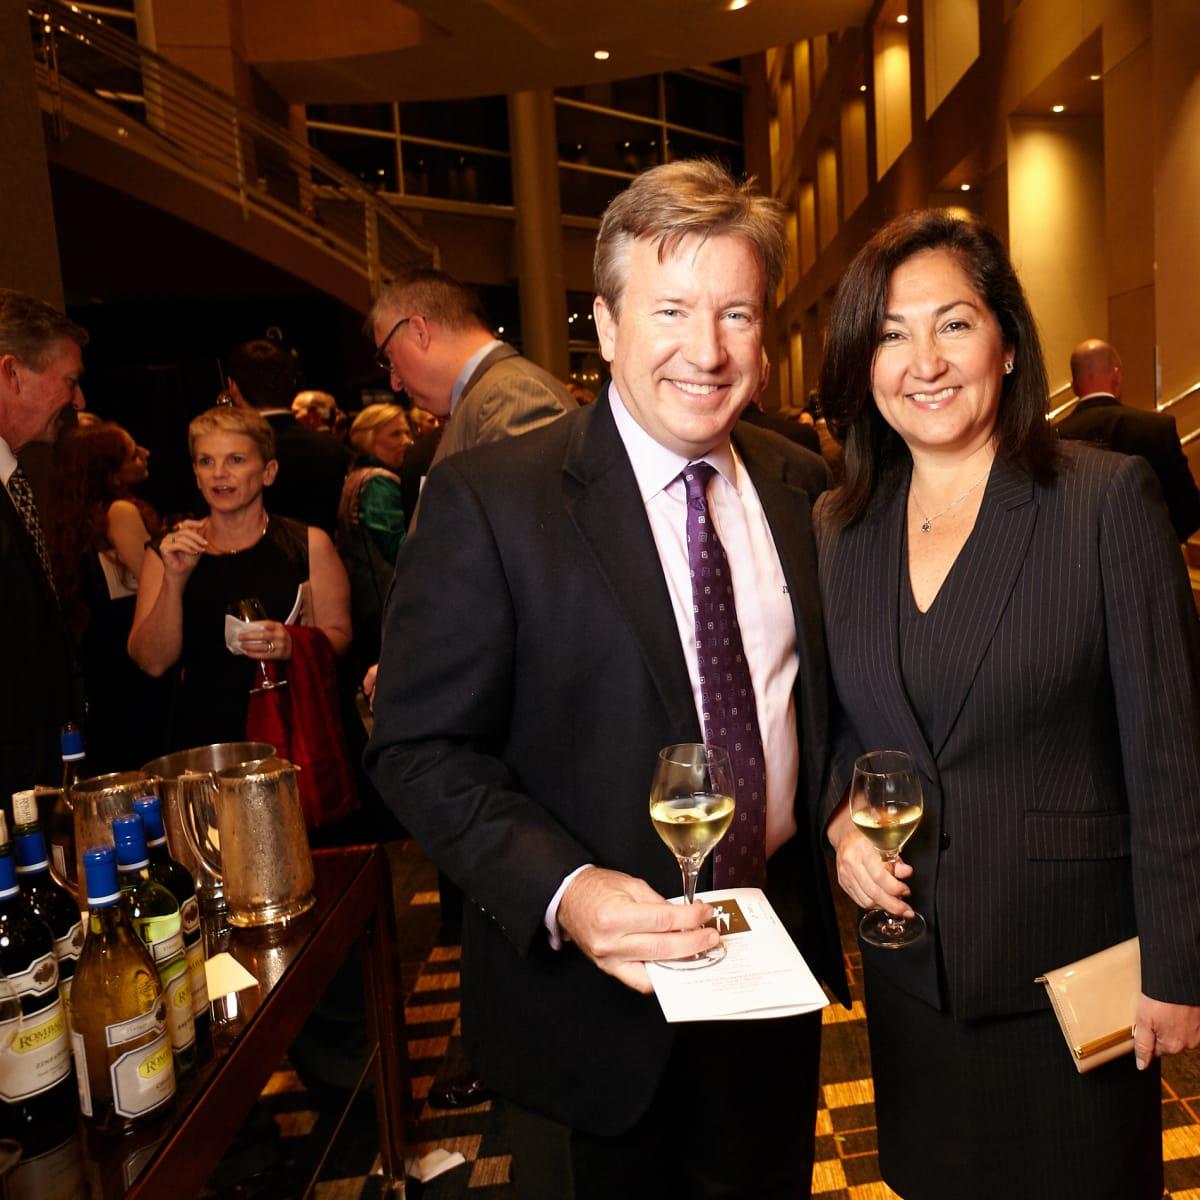 Houston, Bush Library Foundation dinner, November 2017, Paulina McGrath, Jim McGrath